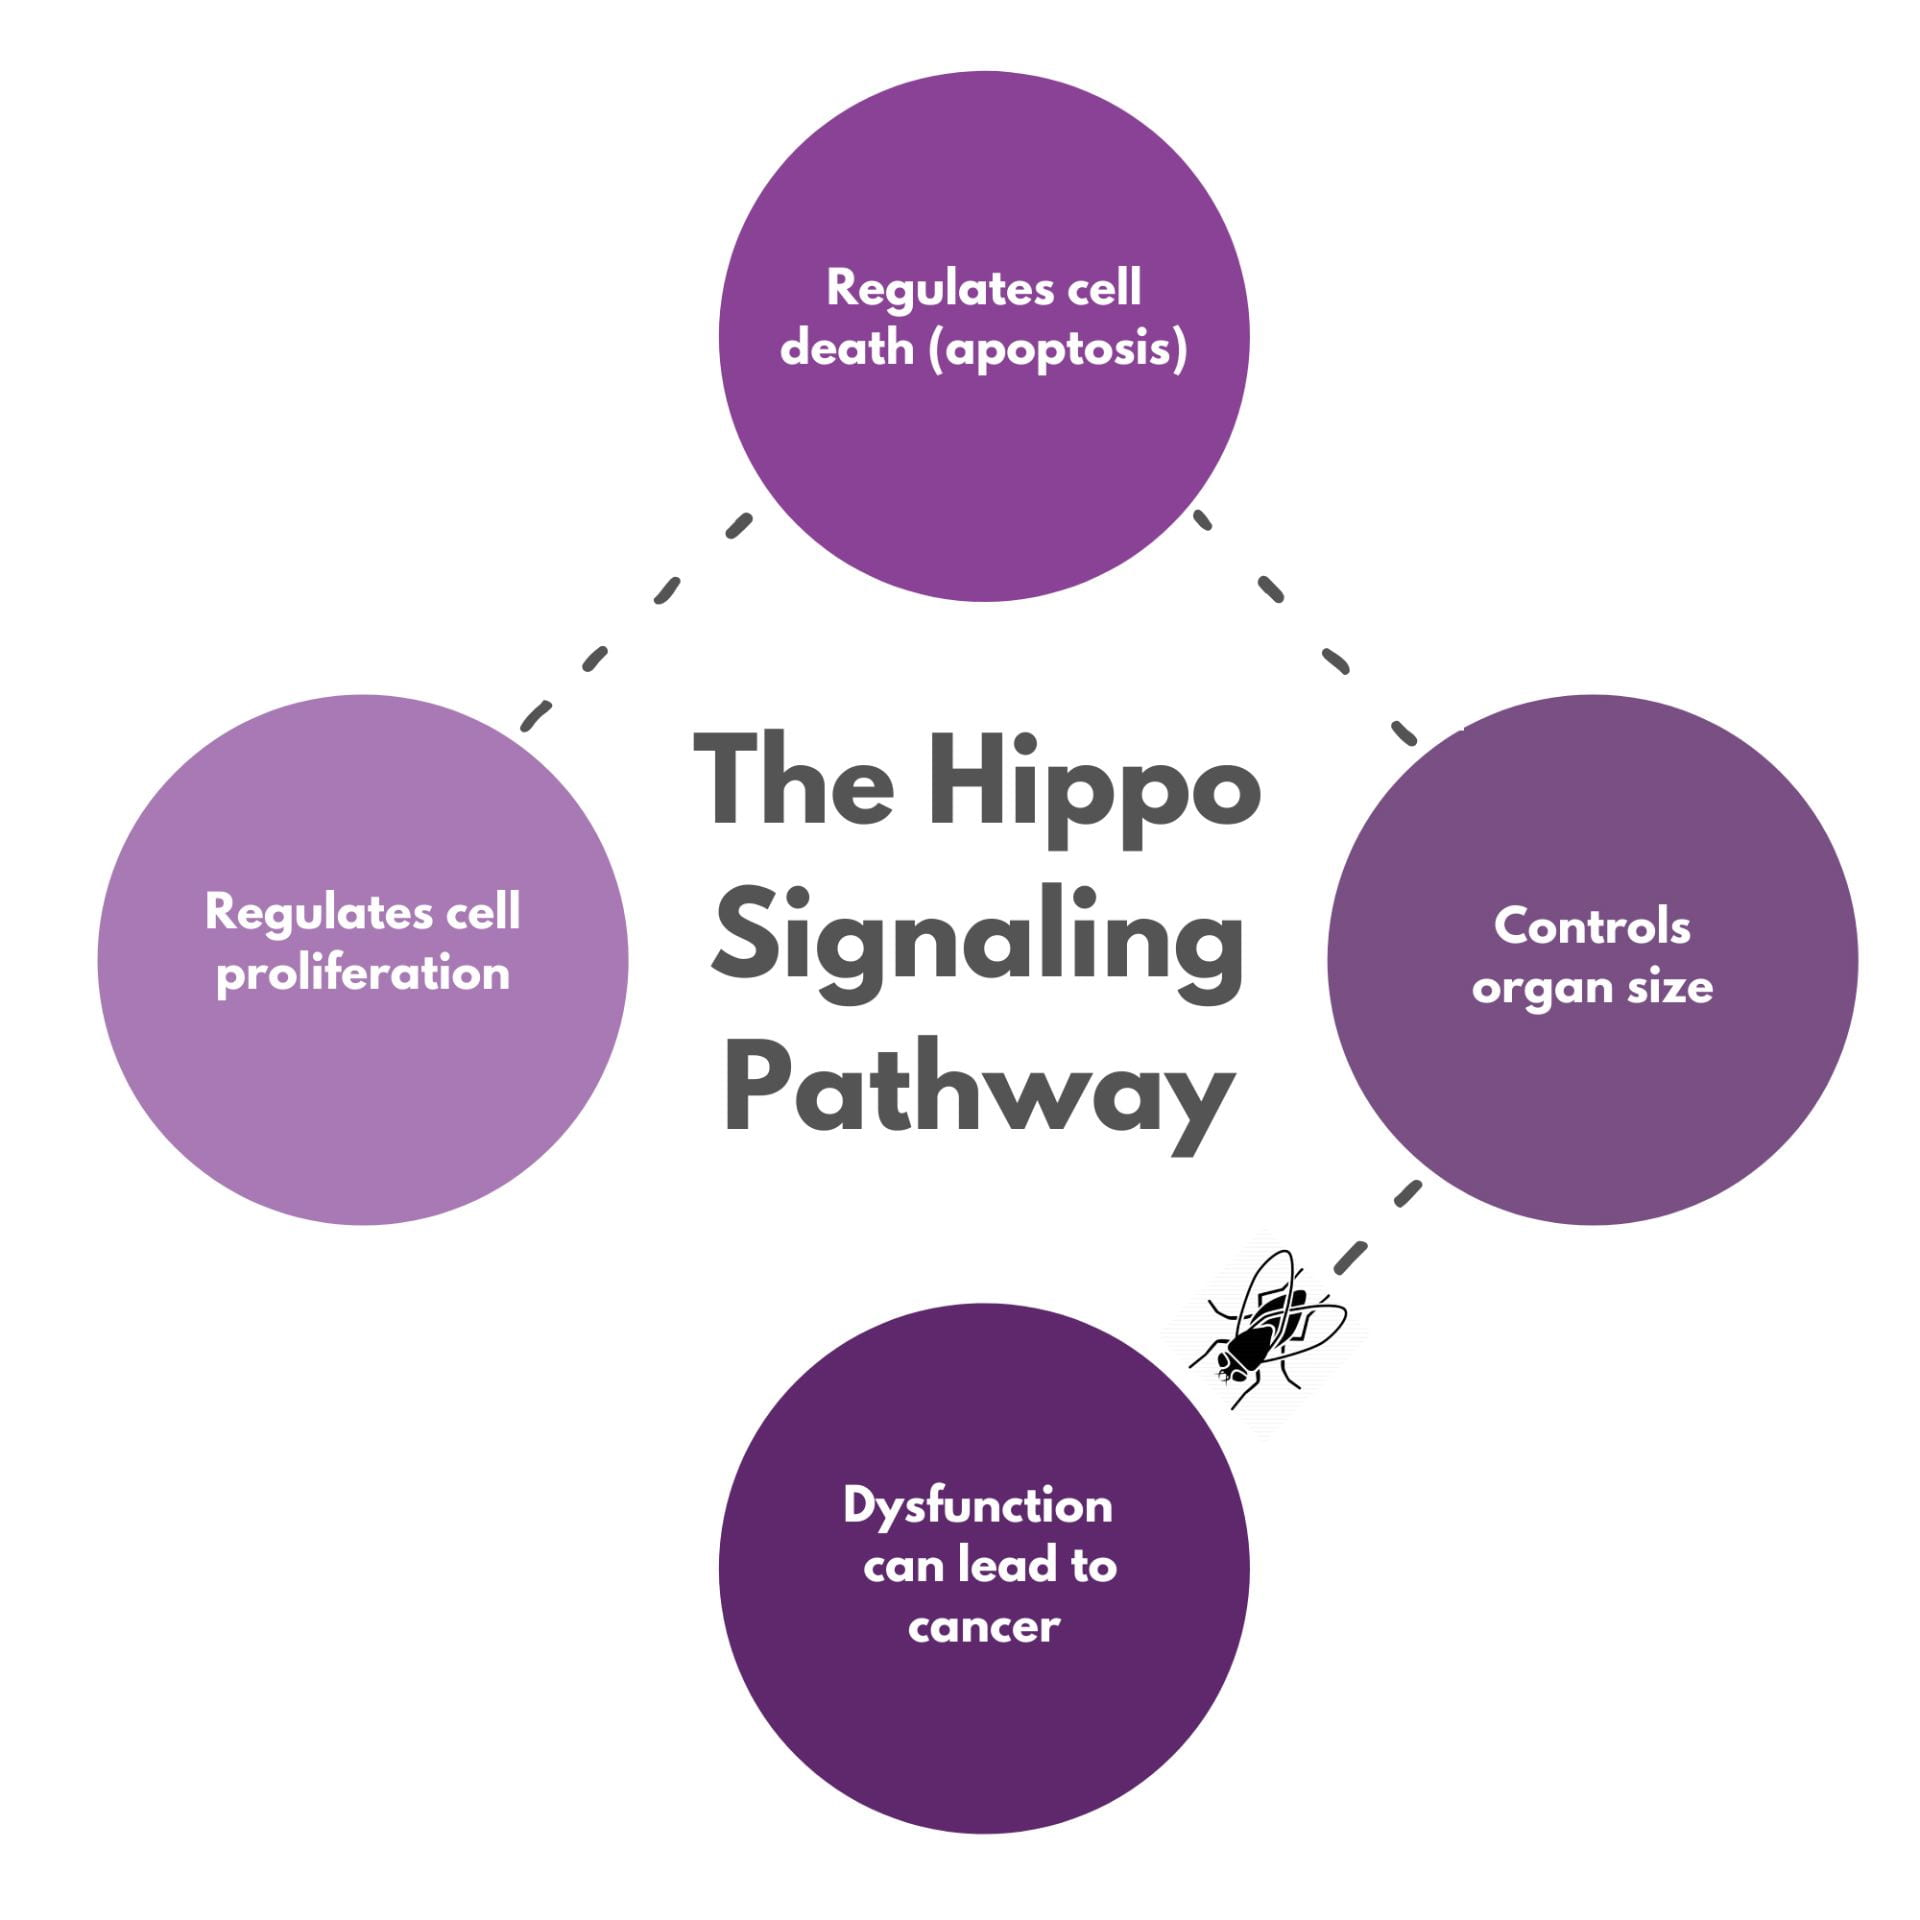 Hippo Signaling Pathway diagram